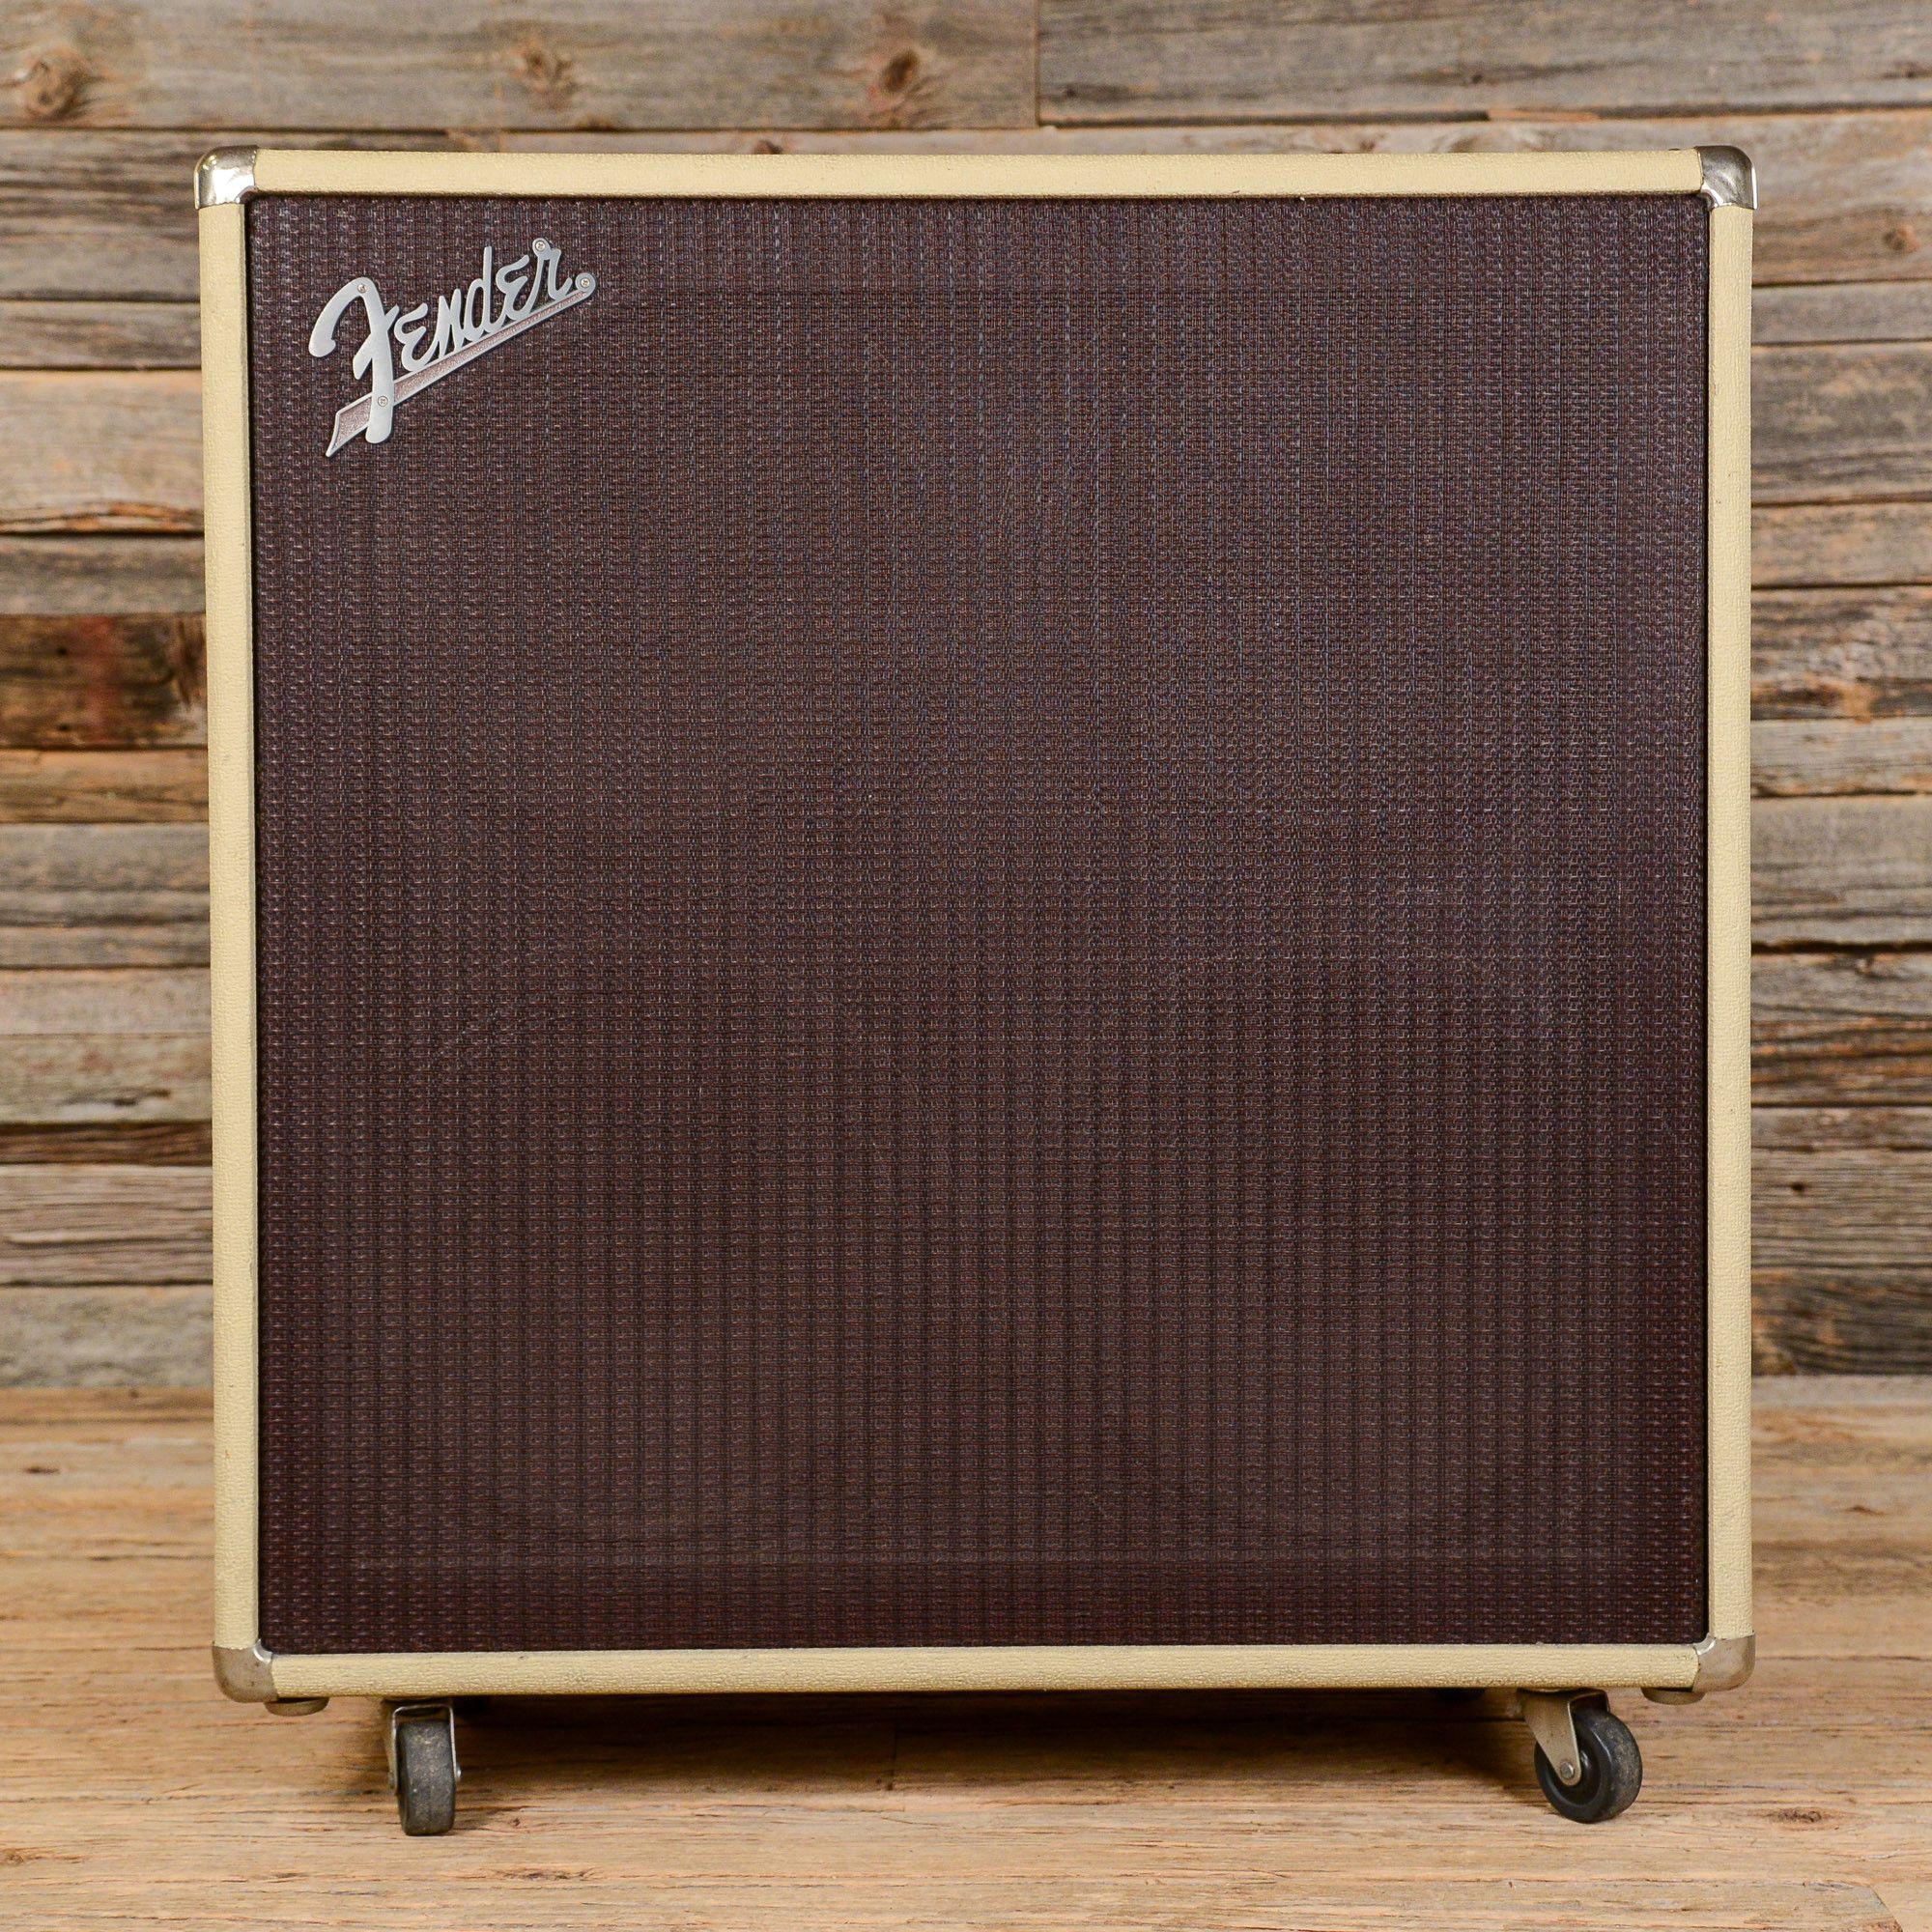 Fender 4x10 Guitar Cabinet Fender Troy Van Leeuwen Jazzmaster Oxblood Cabinets Products